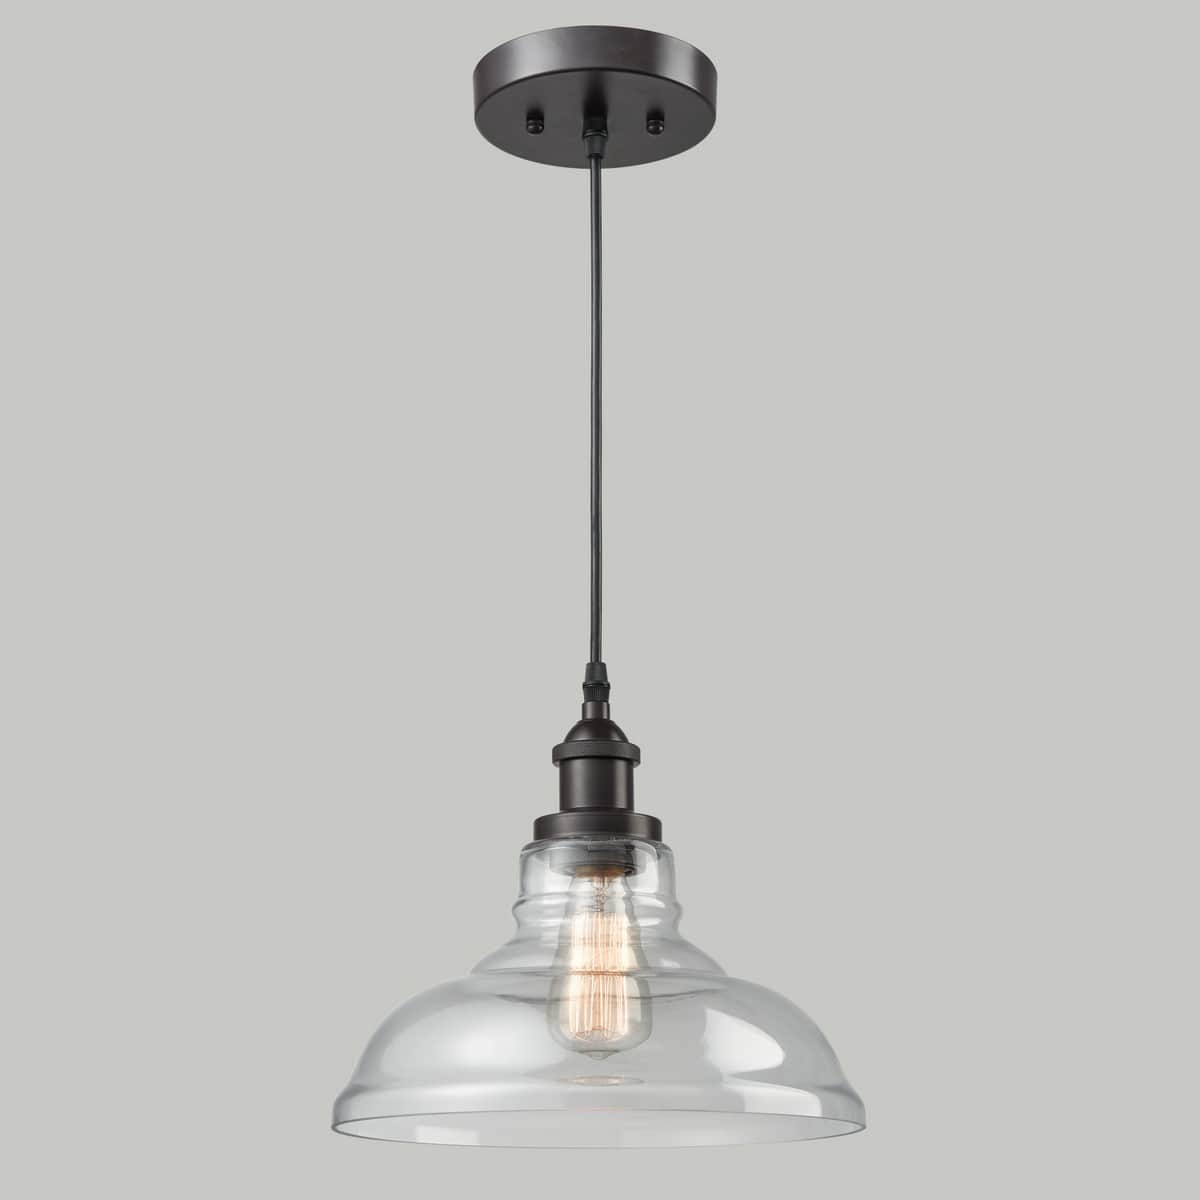 Bronze Industrial Dome Pendant Light Glass Kitchen Fixture